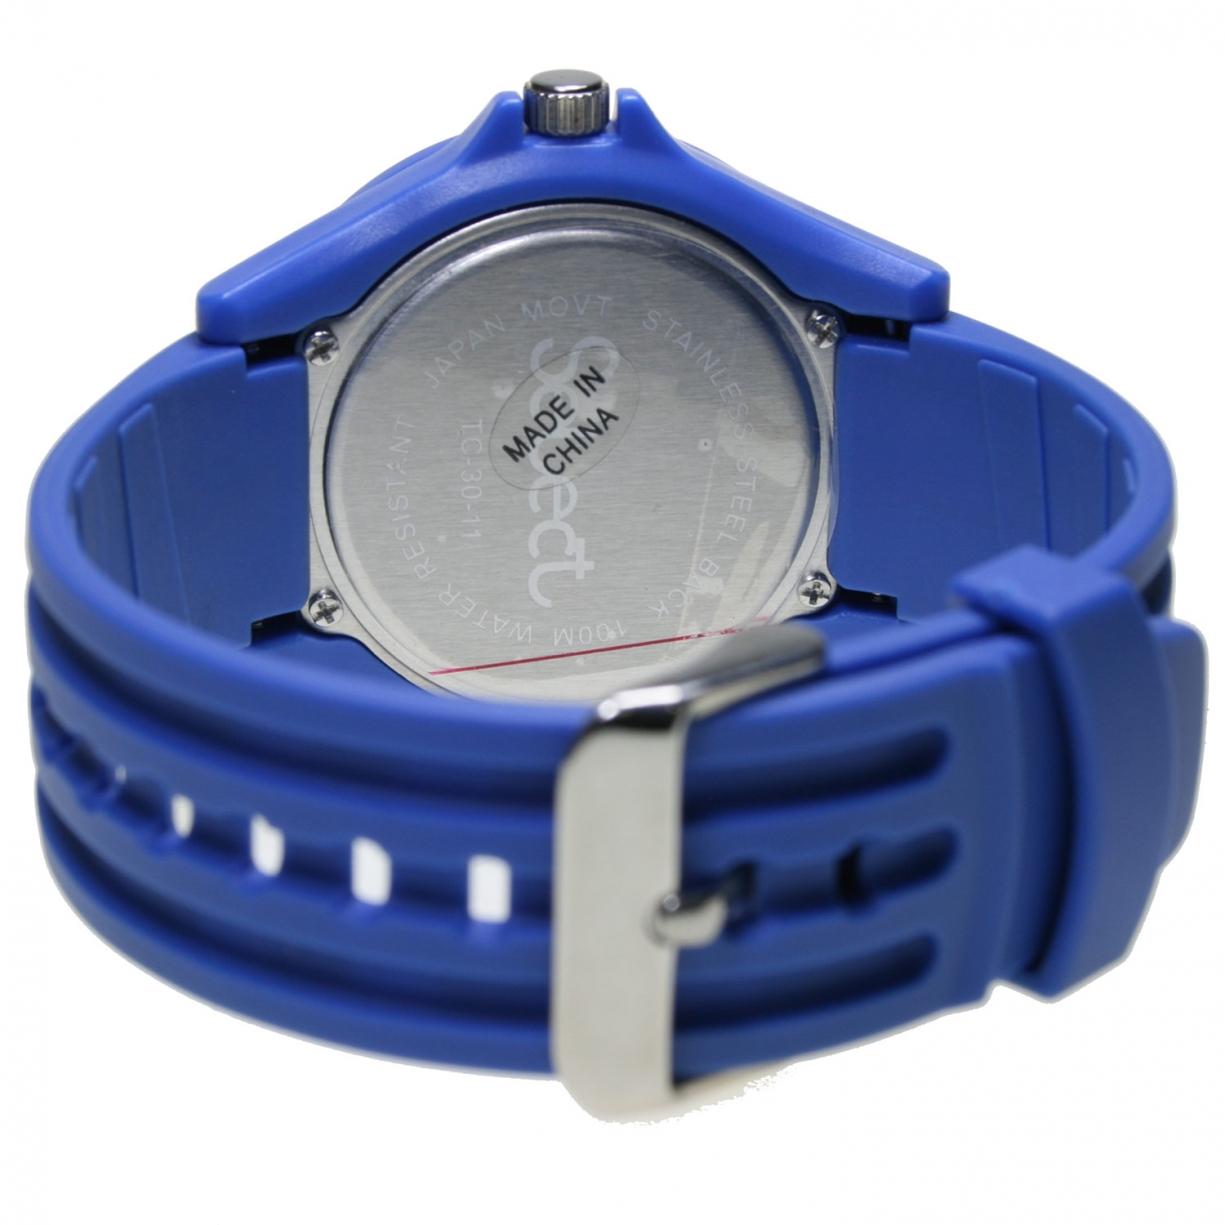 3b1730bd9876 Reloj De Pulsera Select Analogico Para Unisex. Modelo Tc-30-11